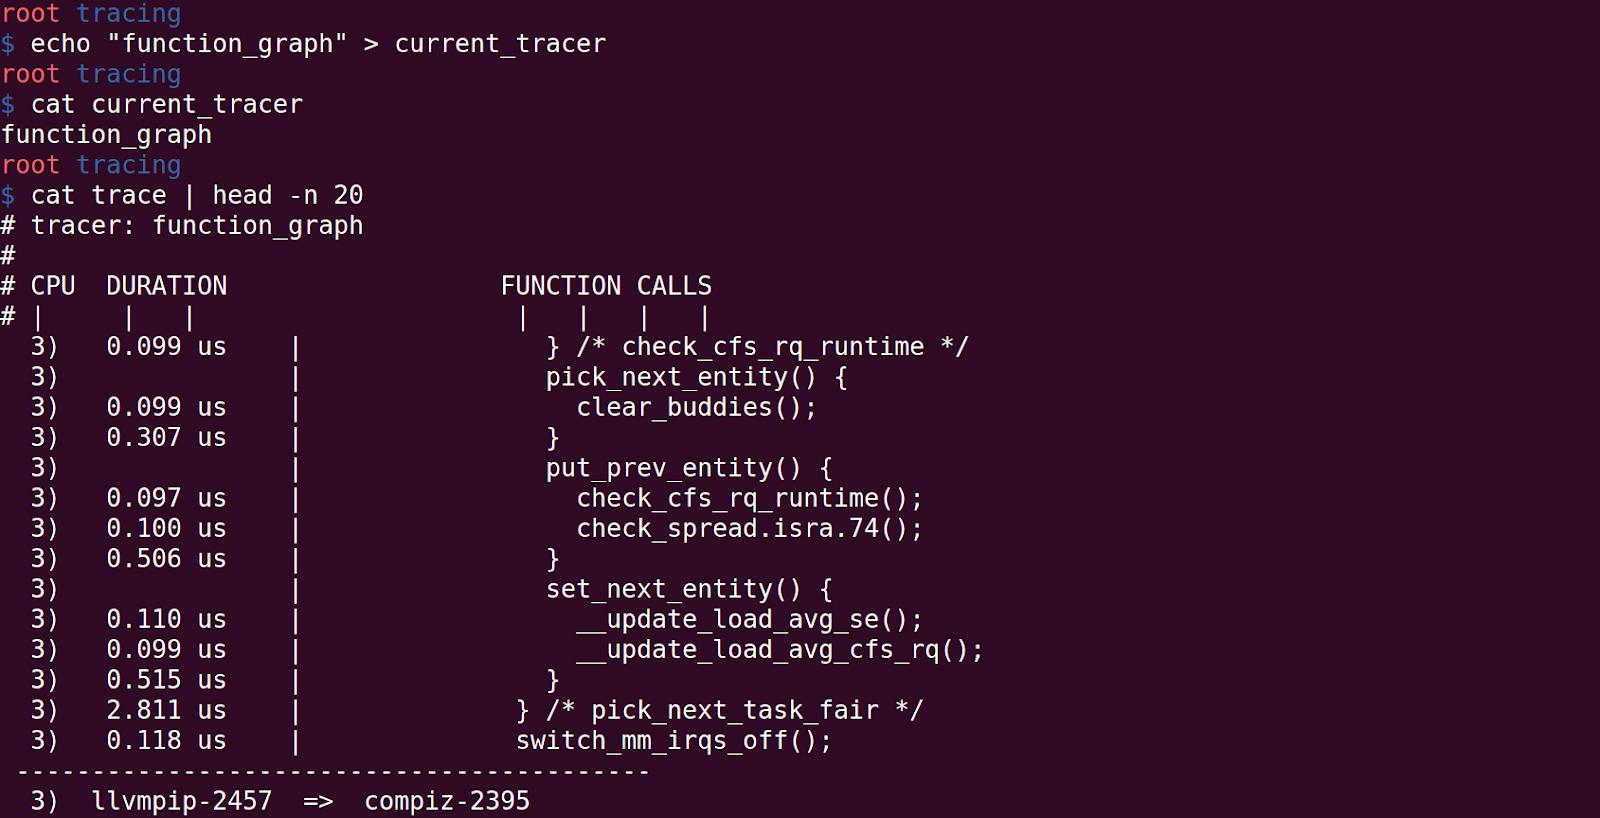 Debugging Linux Kernel using ftrace Part3 - Function Graph